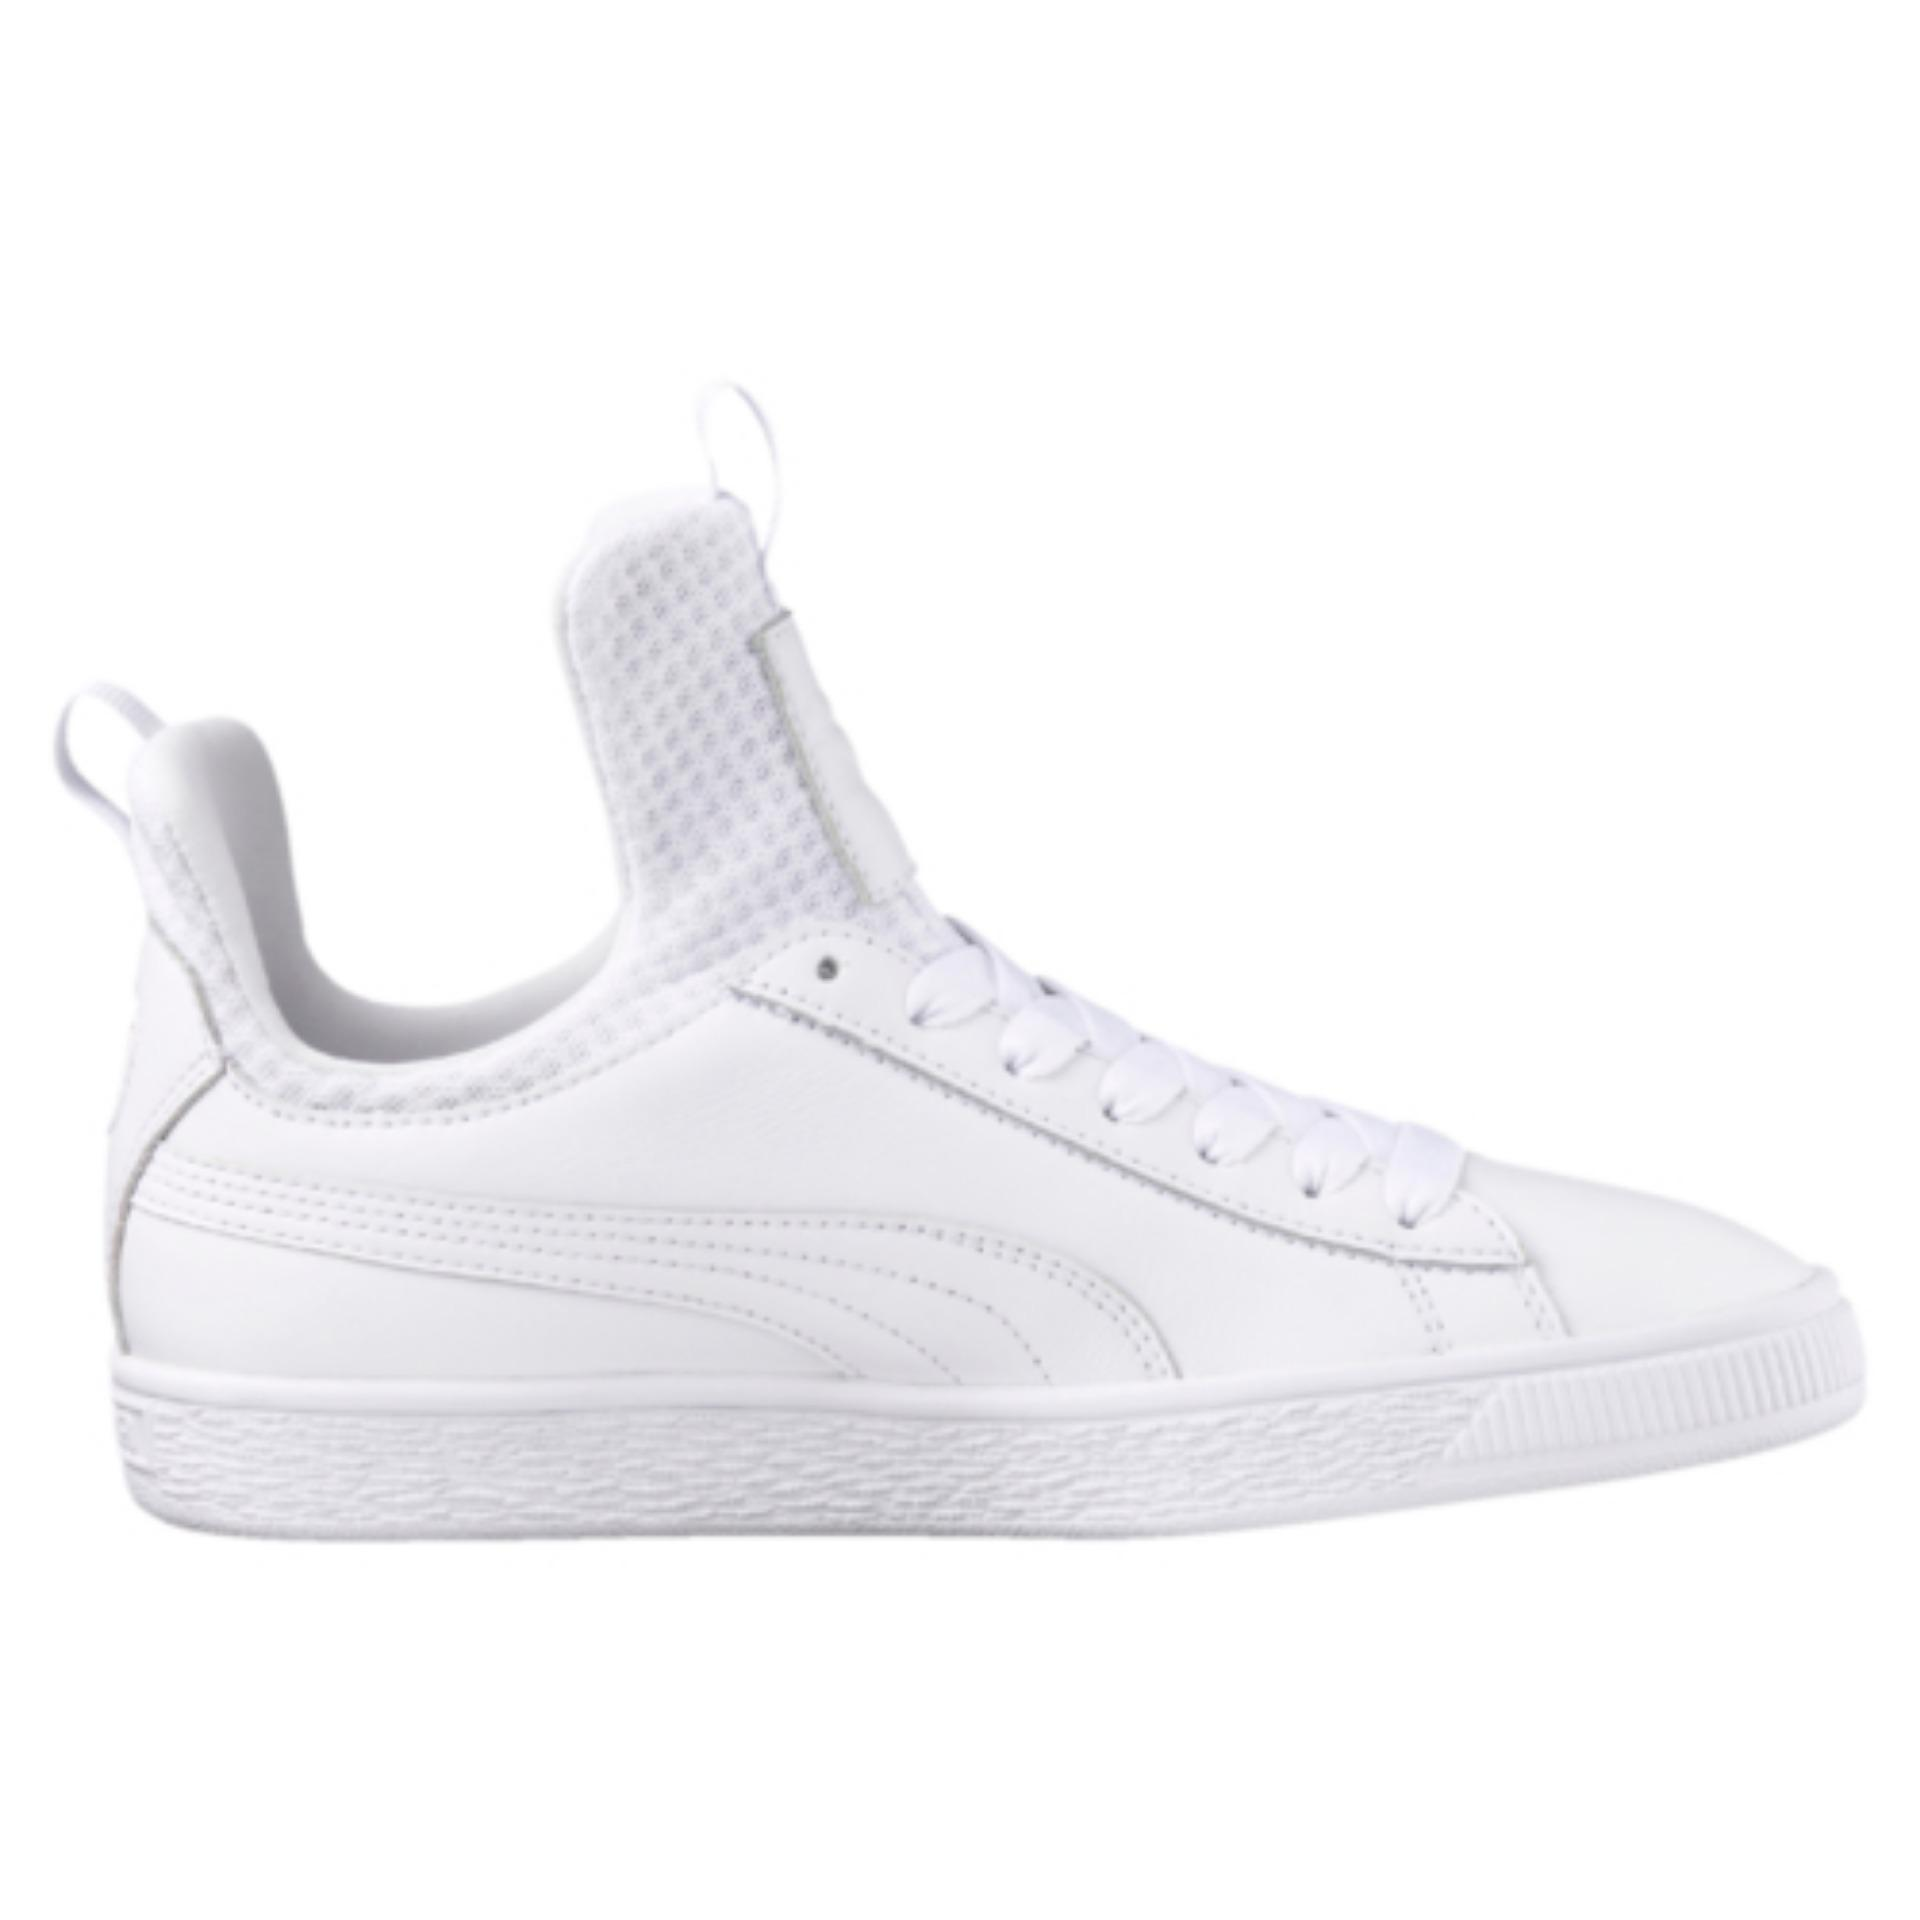 Puma Basket Fierce EP Women Sneakers - Puma White 5d0723b13578